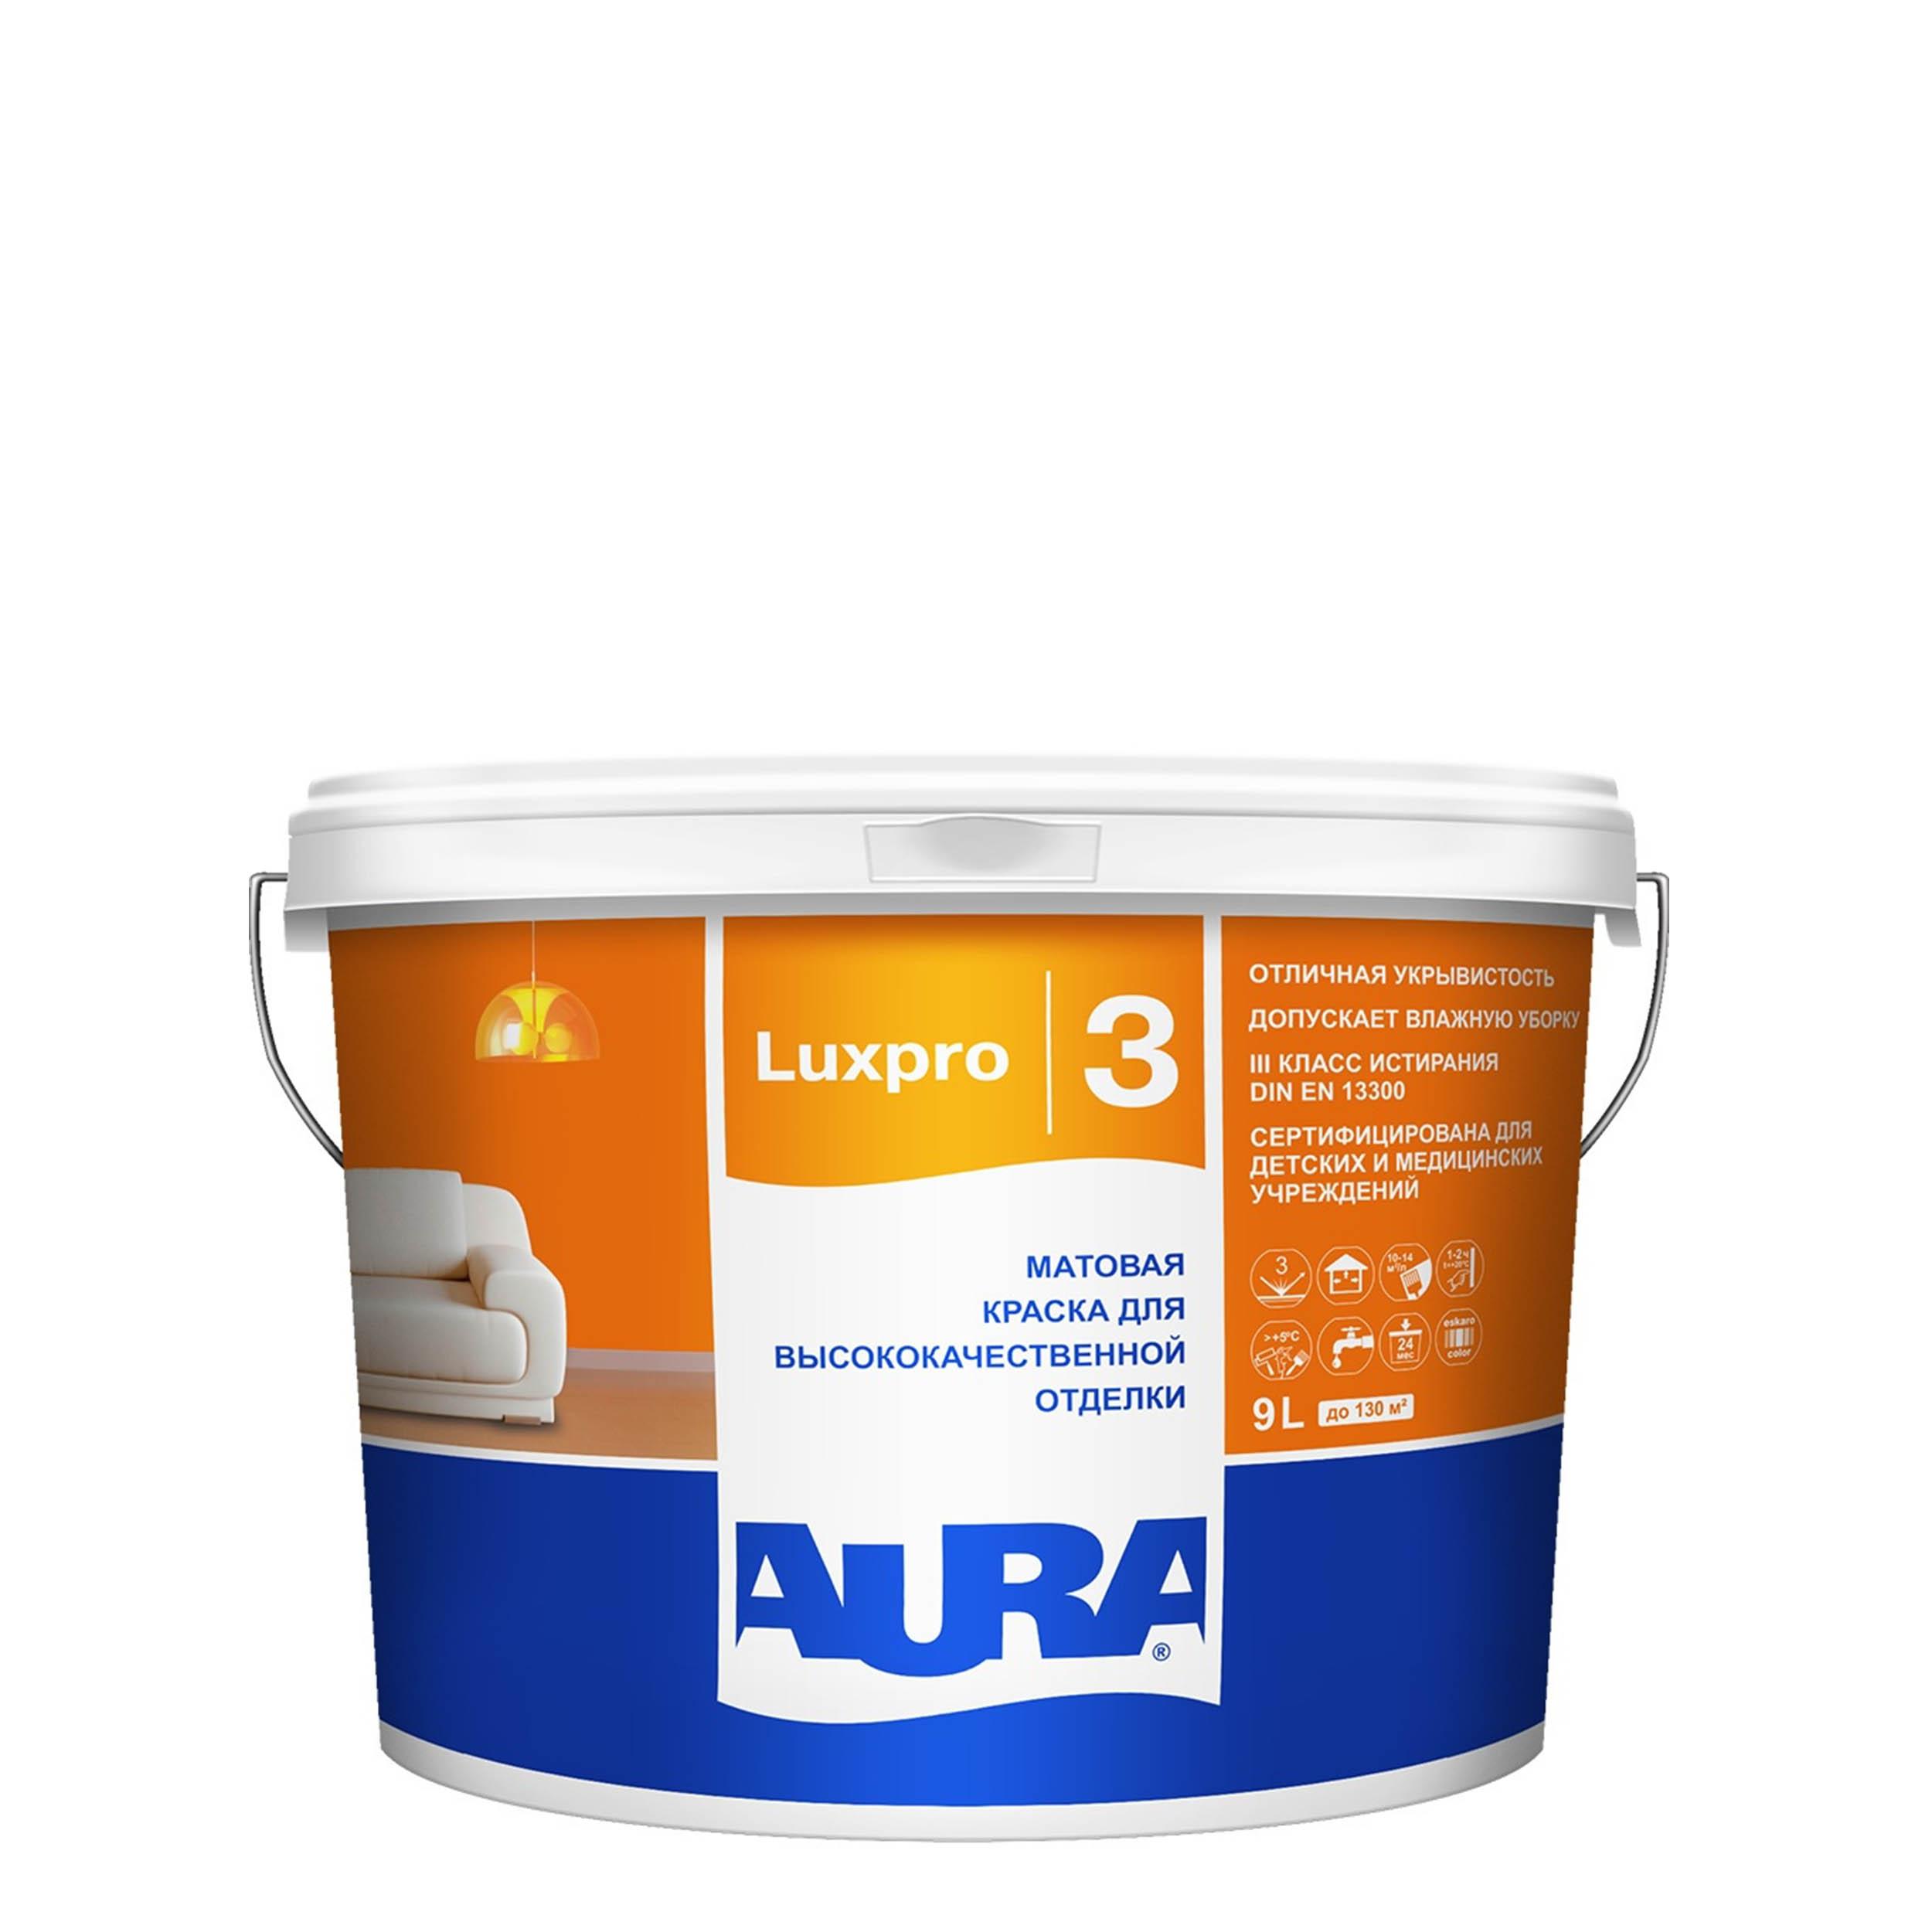 Фото 3 - Краска интерьерная, Aura LuxPRO 3, RAL 5015, 11 кг.